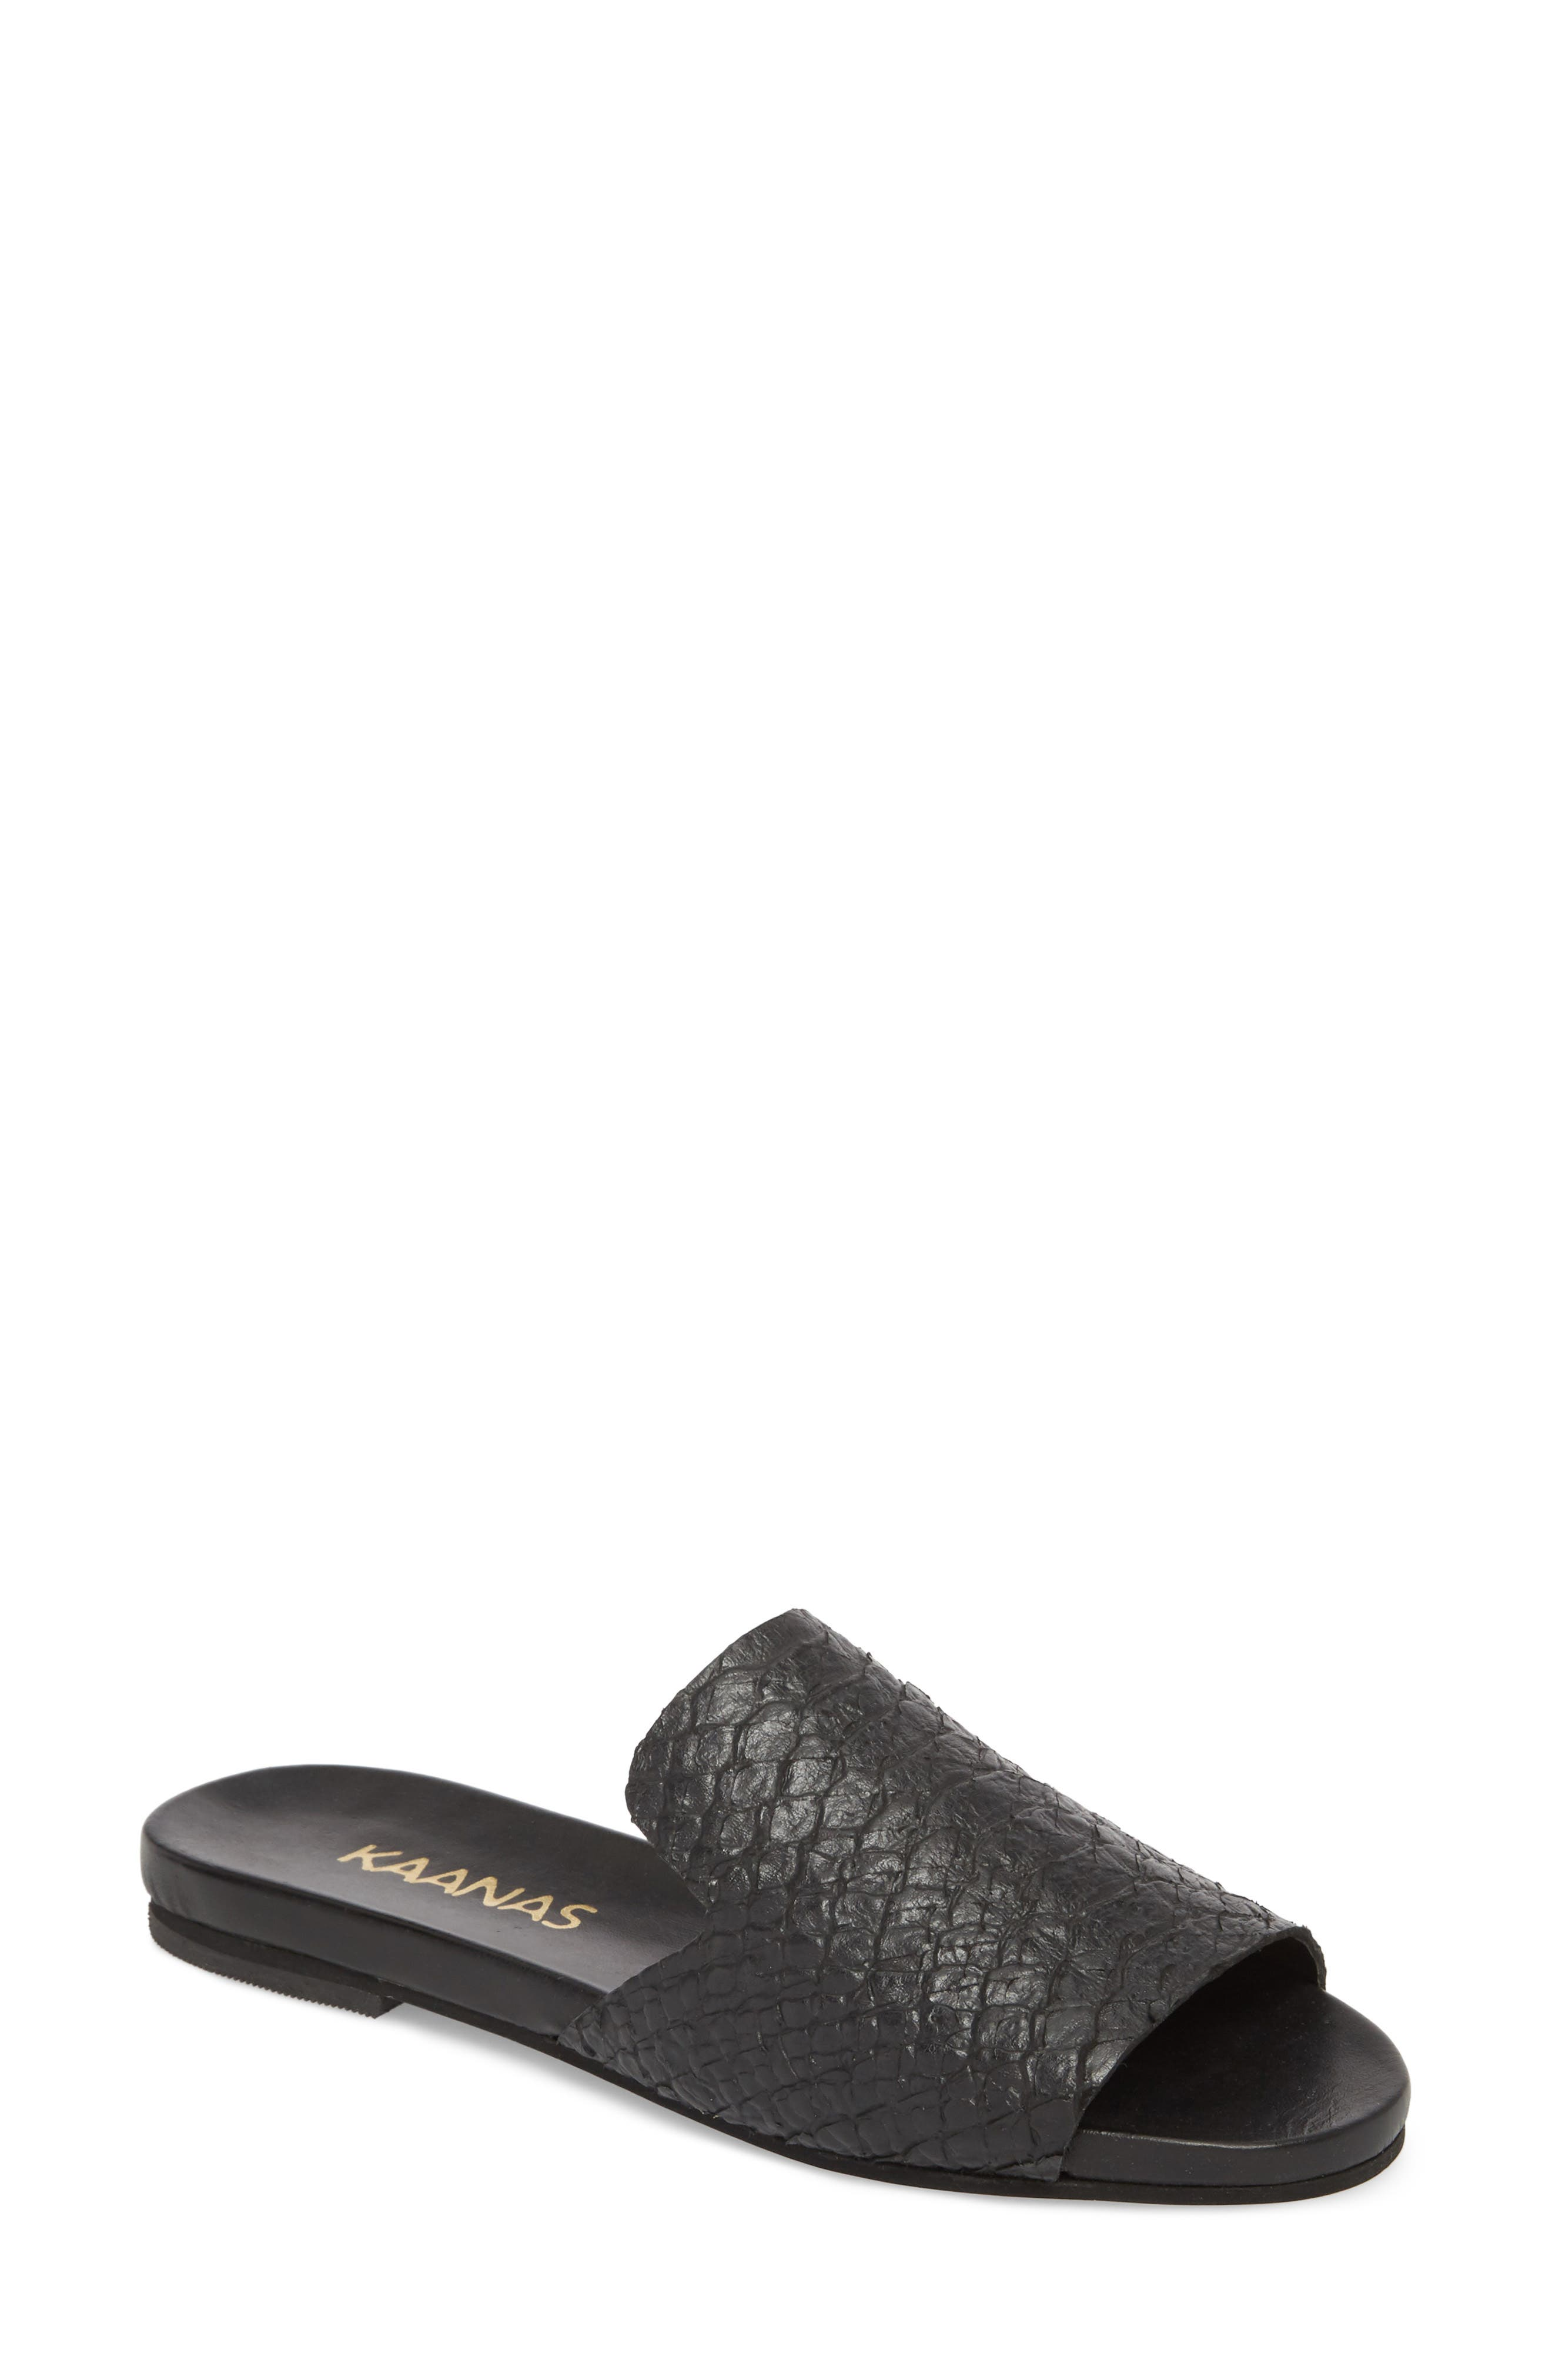 Leticia Loafer Mule Sandal,                             Main thumbnail 1, color,                             BLACK